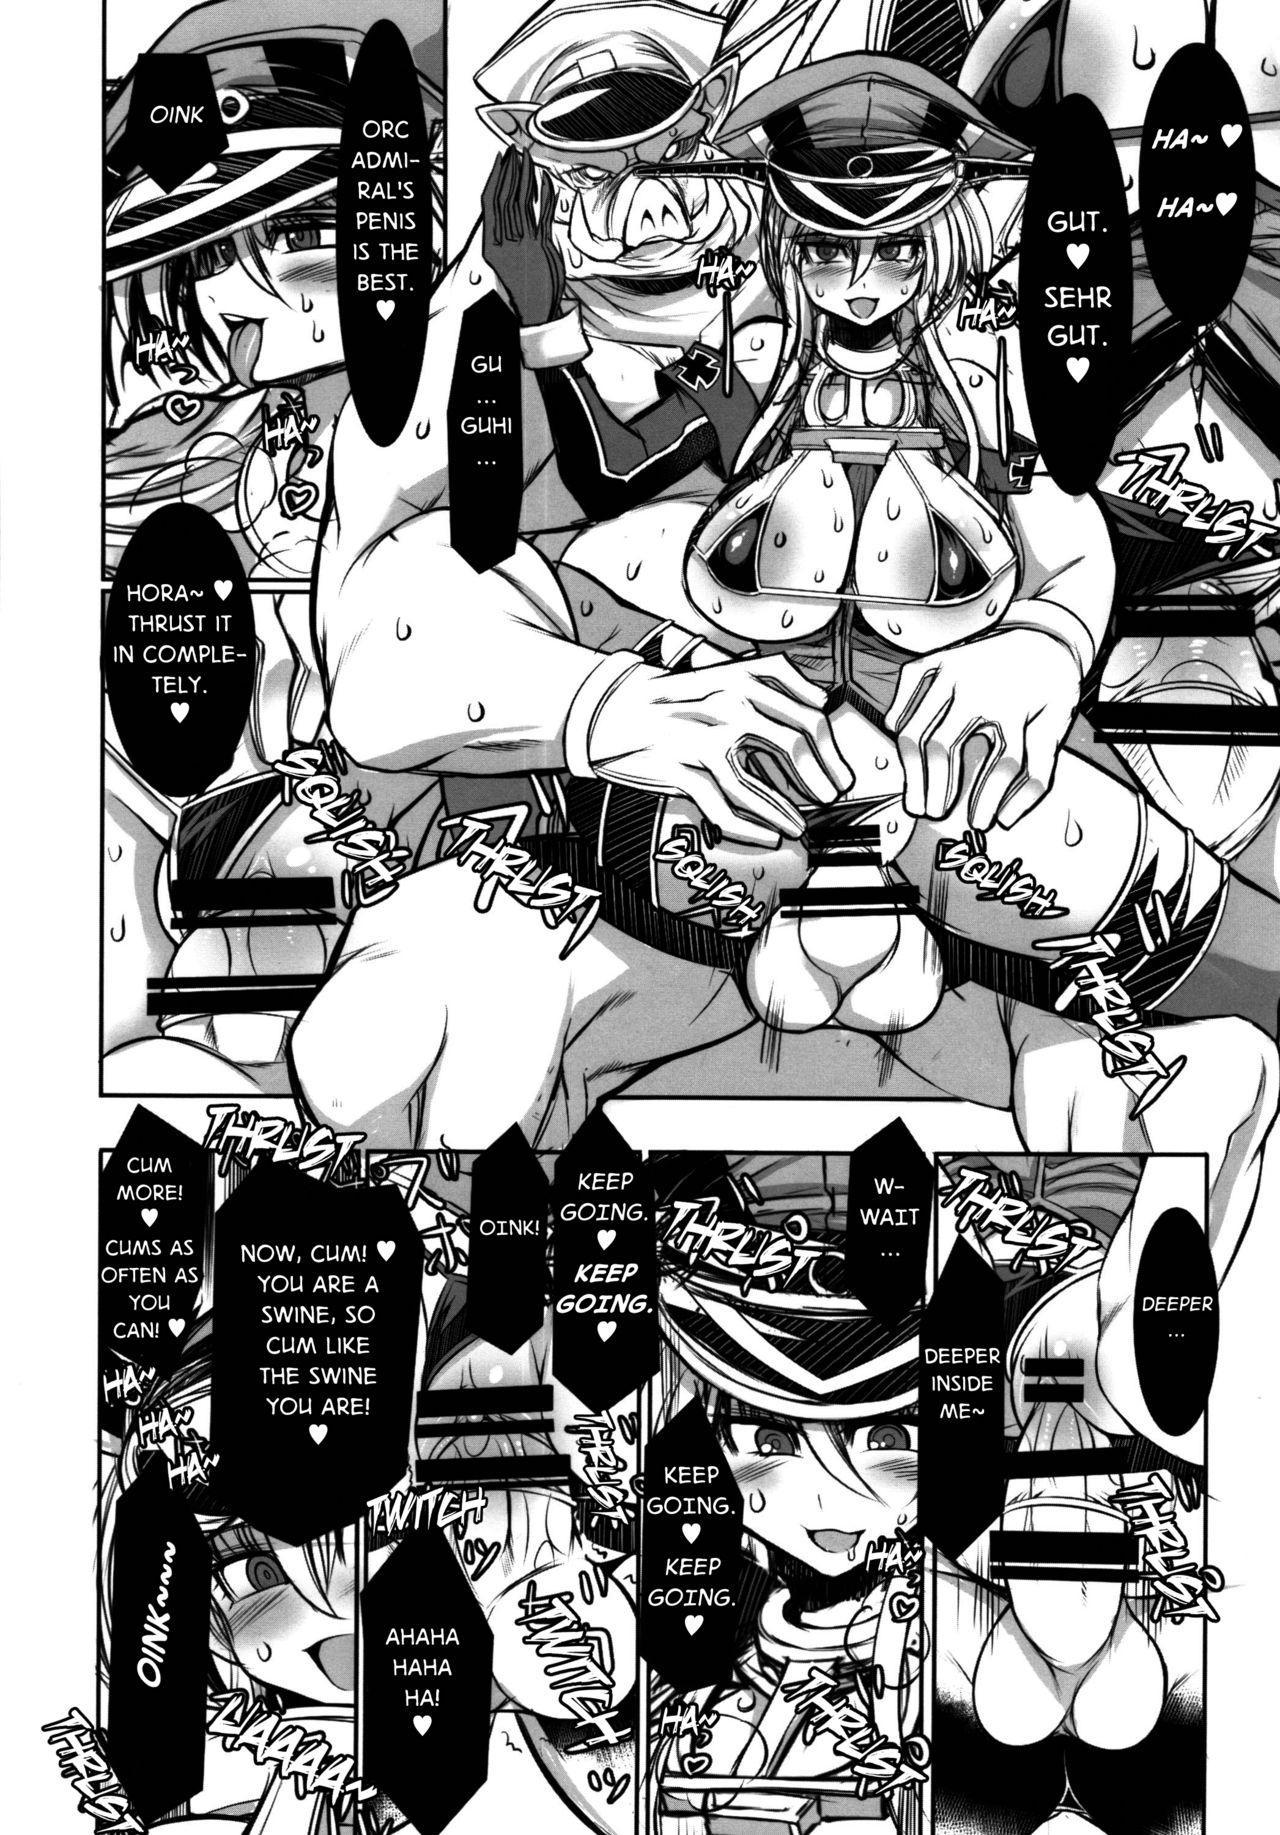 Himekishi Senkan Bismarck Toraware no Himesenkan | The Captured Princess Knight Battleship Bismarck 19